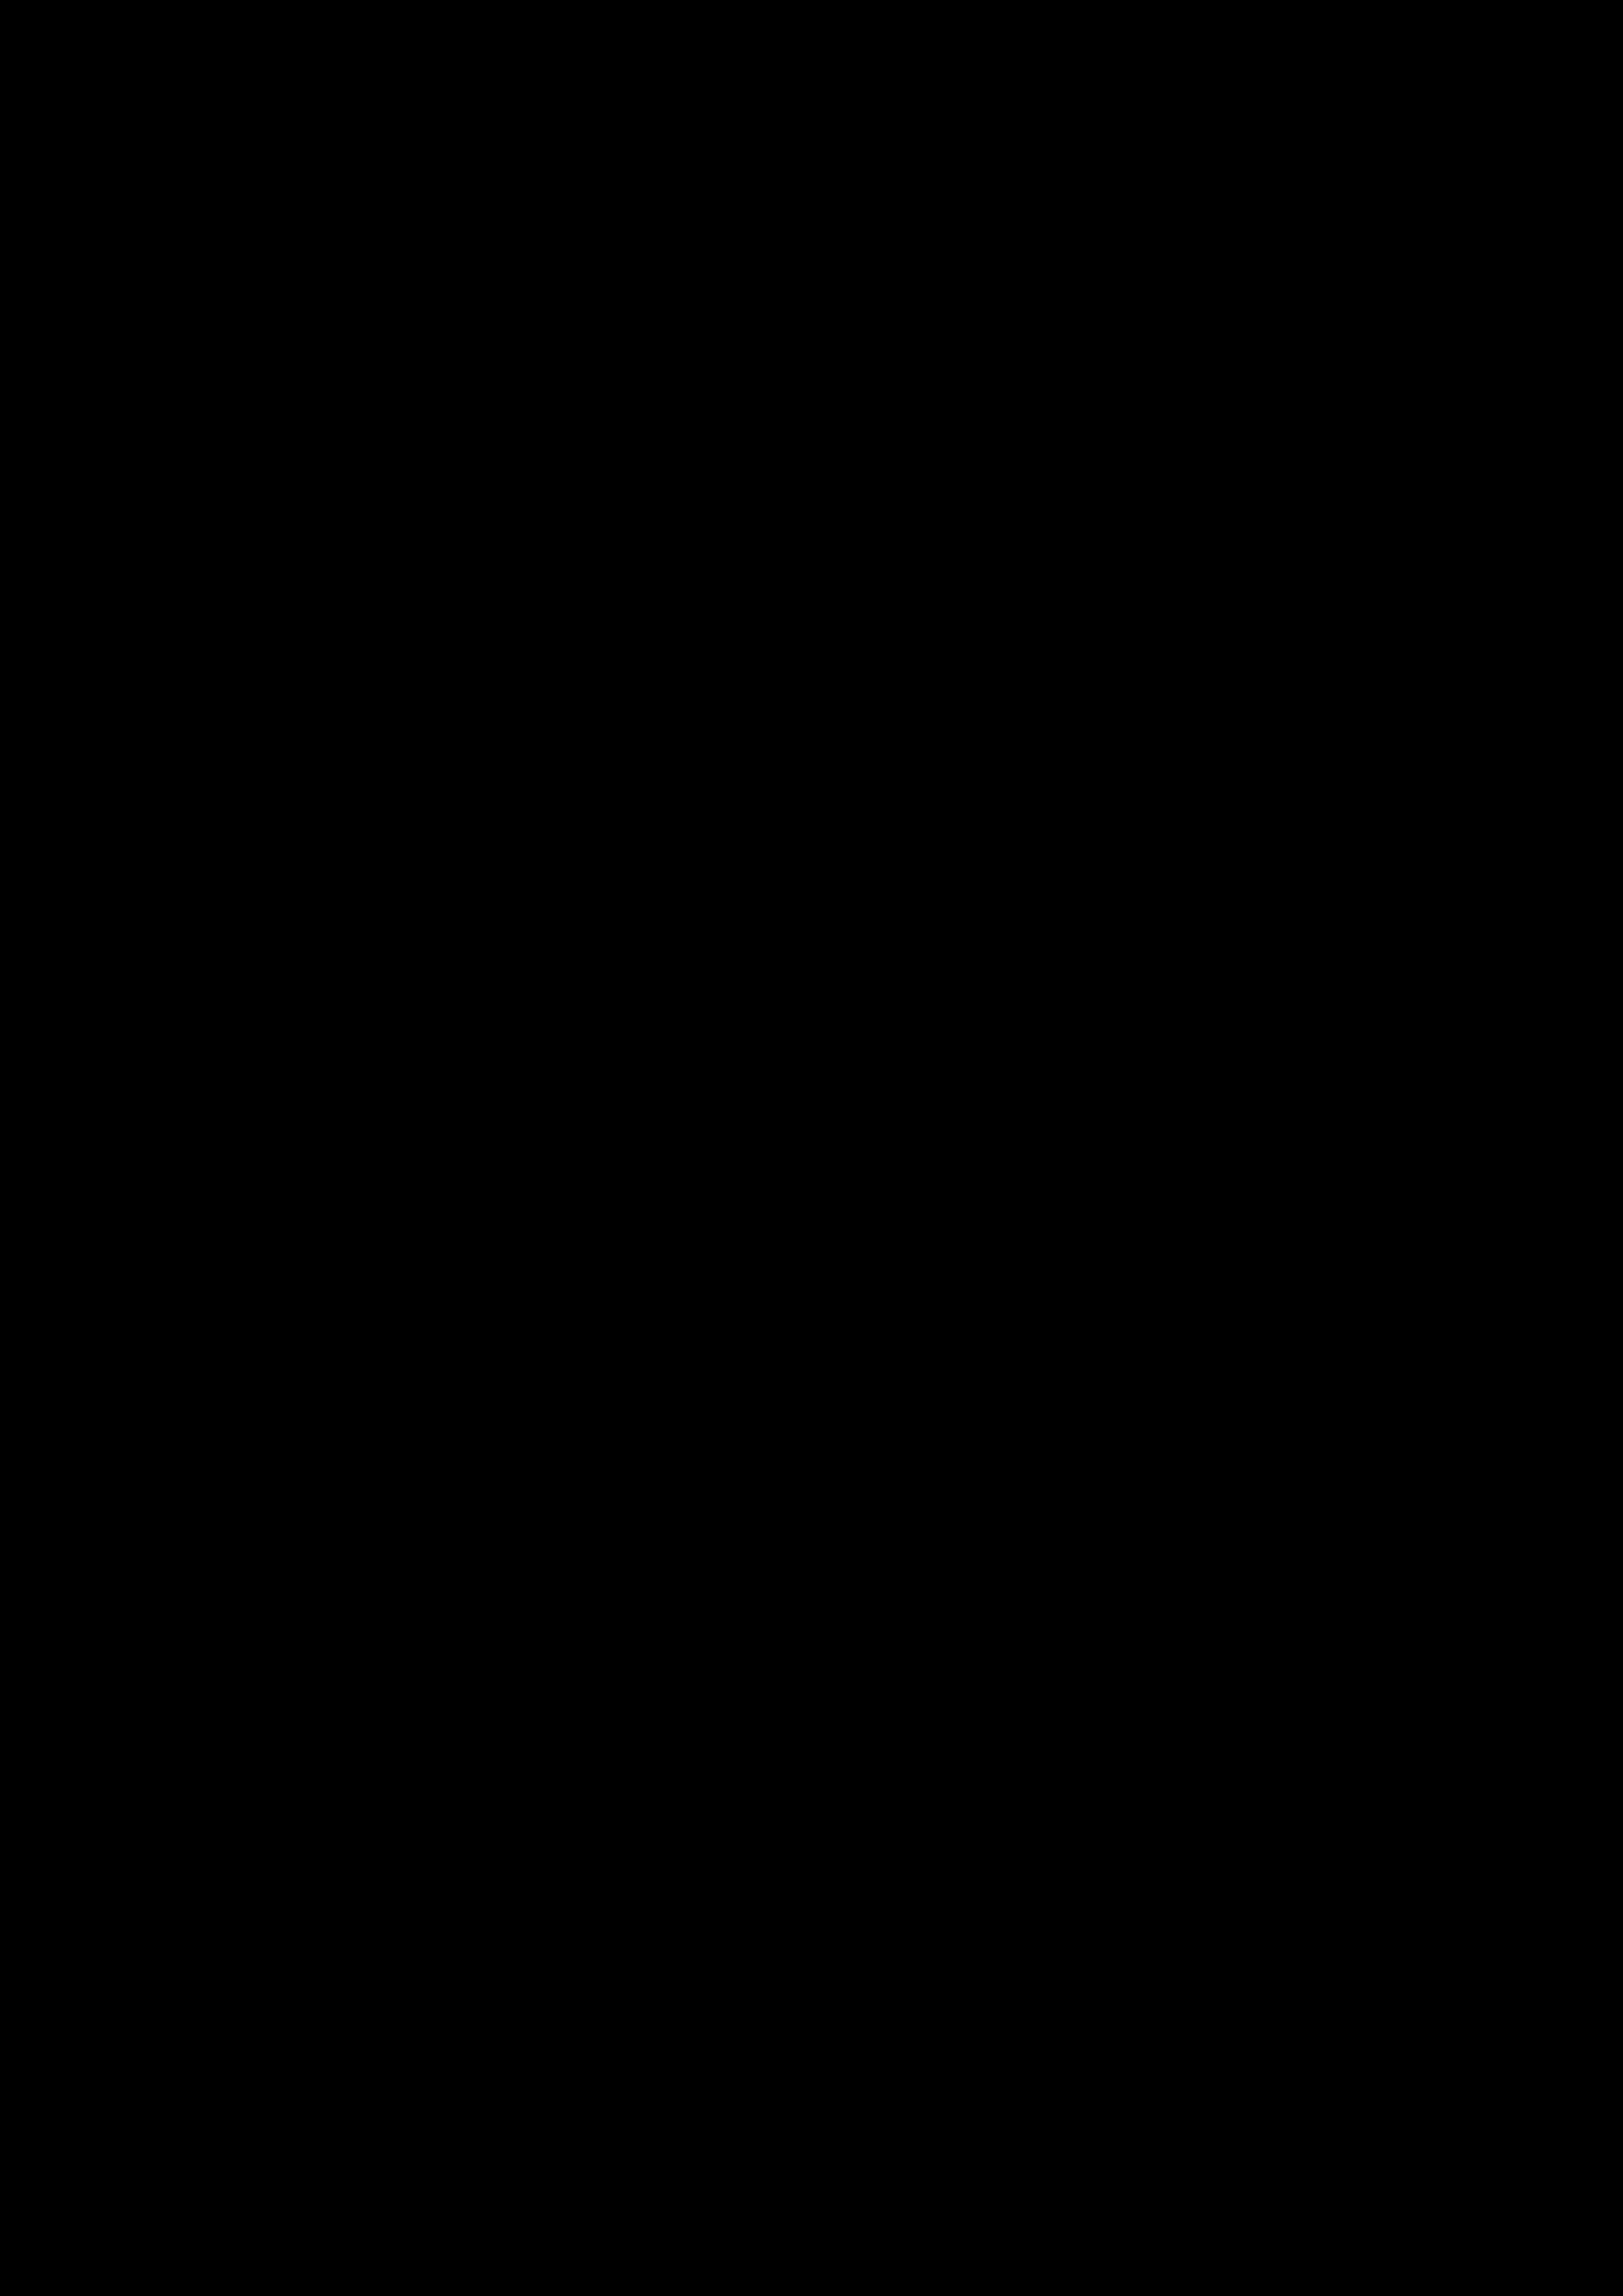 Lake clipart icon. Salt temple silhouette